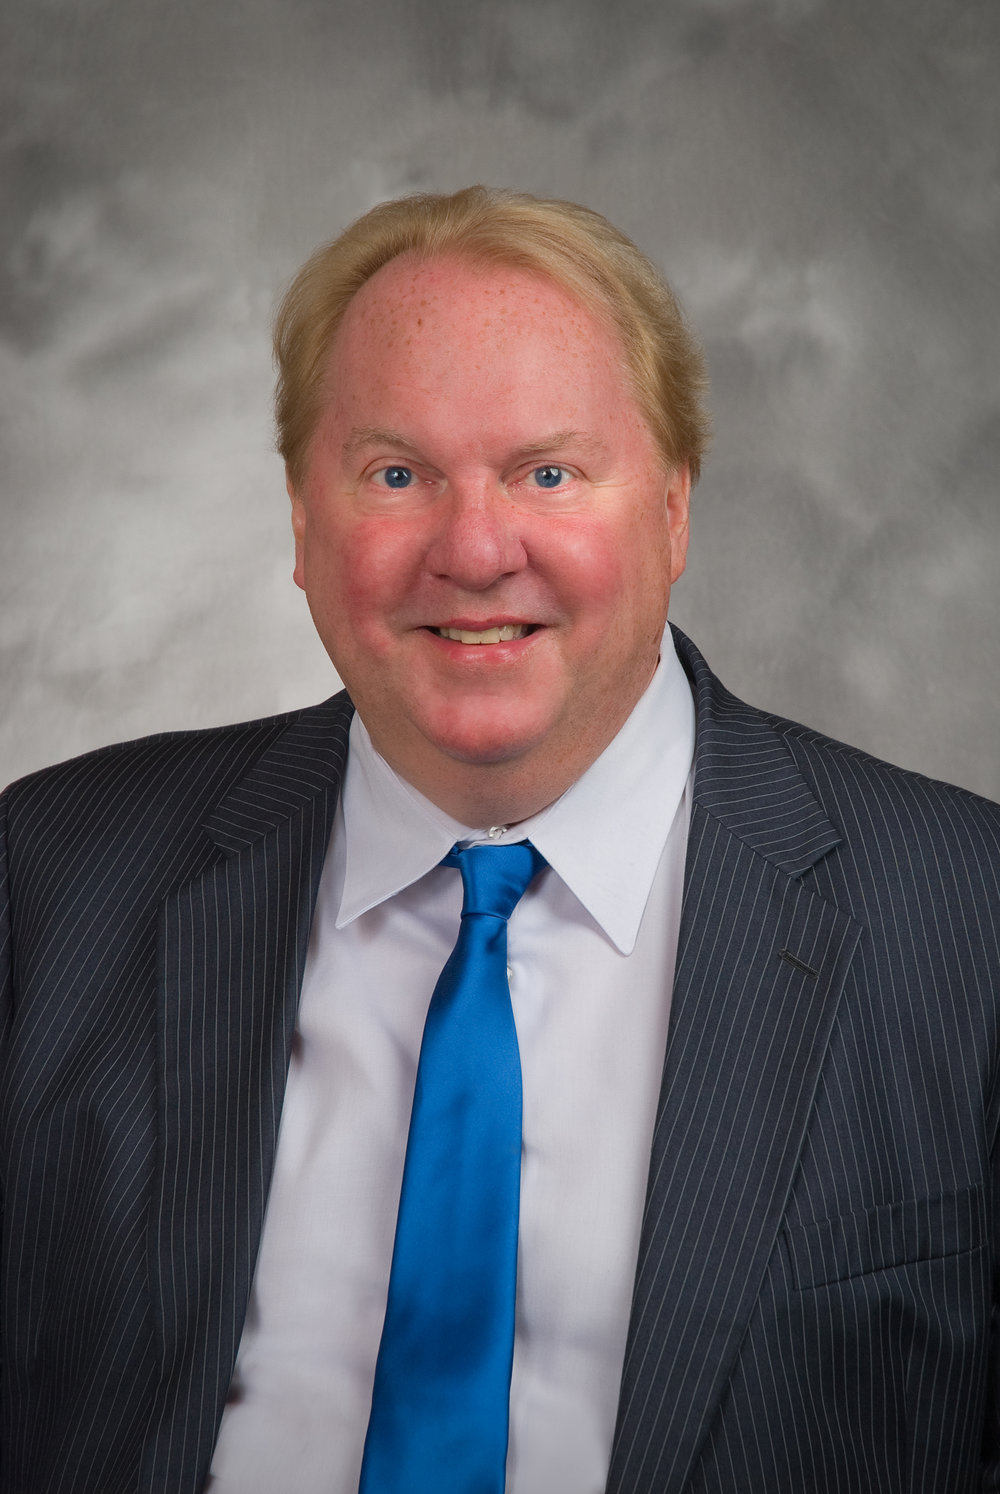 Brad King Co-Director (317) 232-3939  bking@iec.in.gov   Website